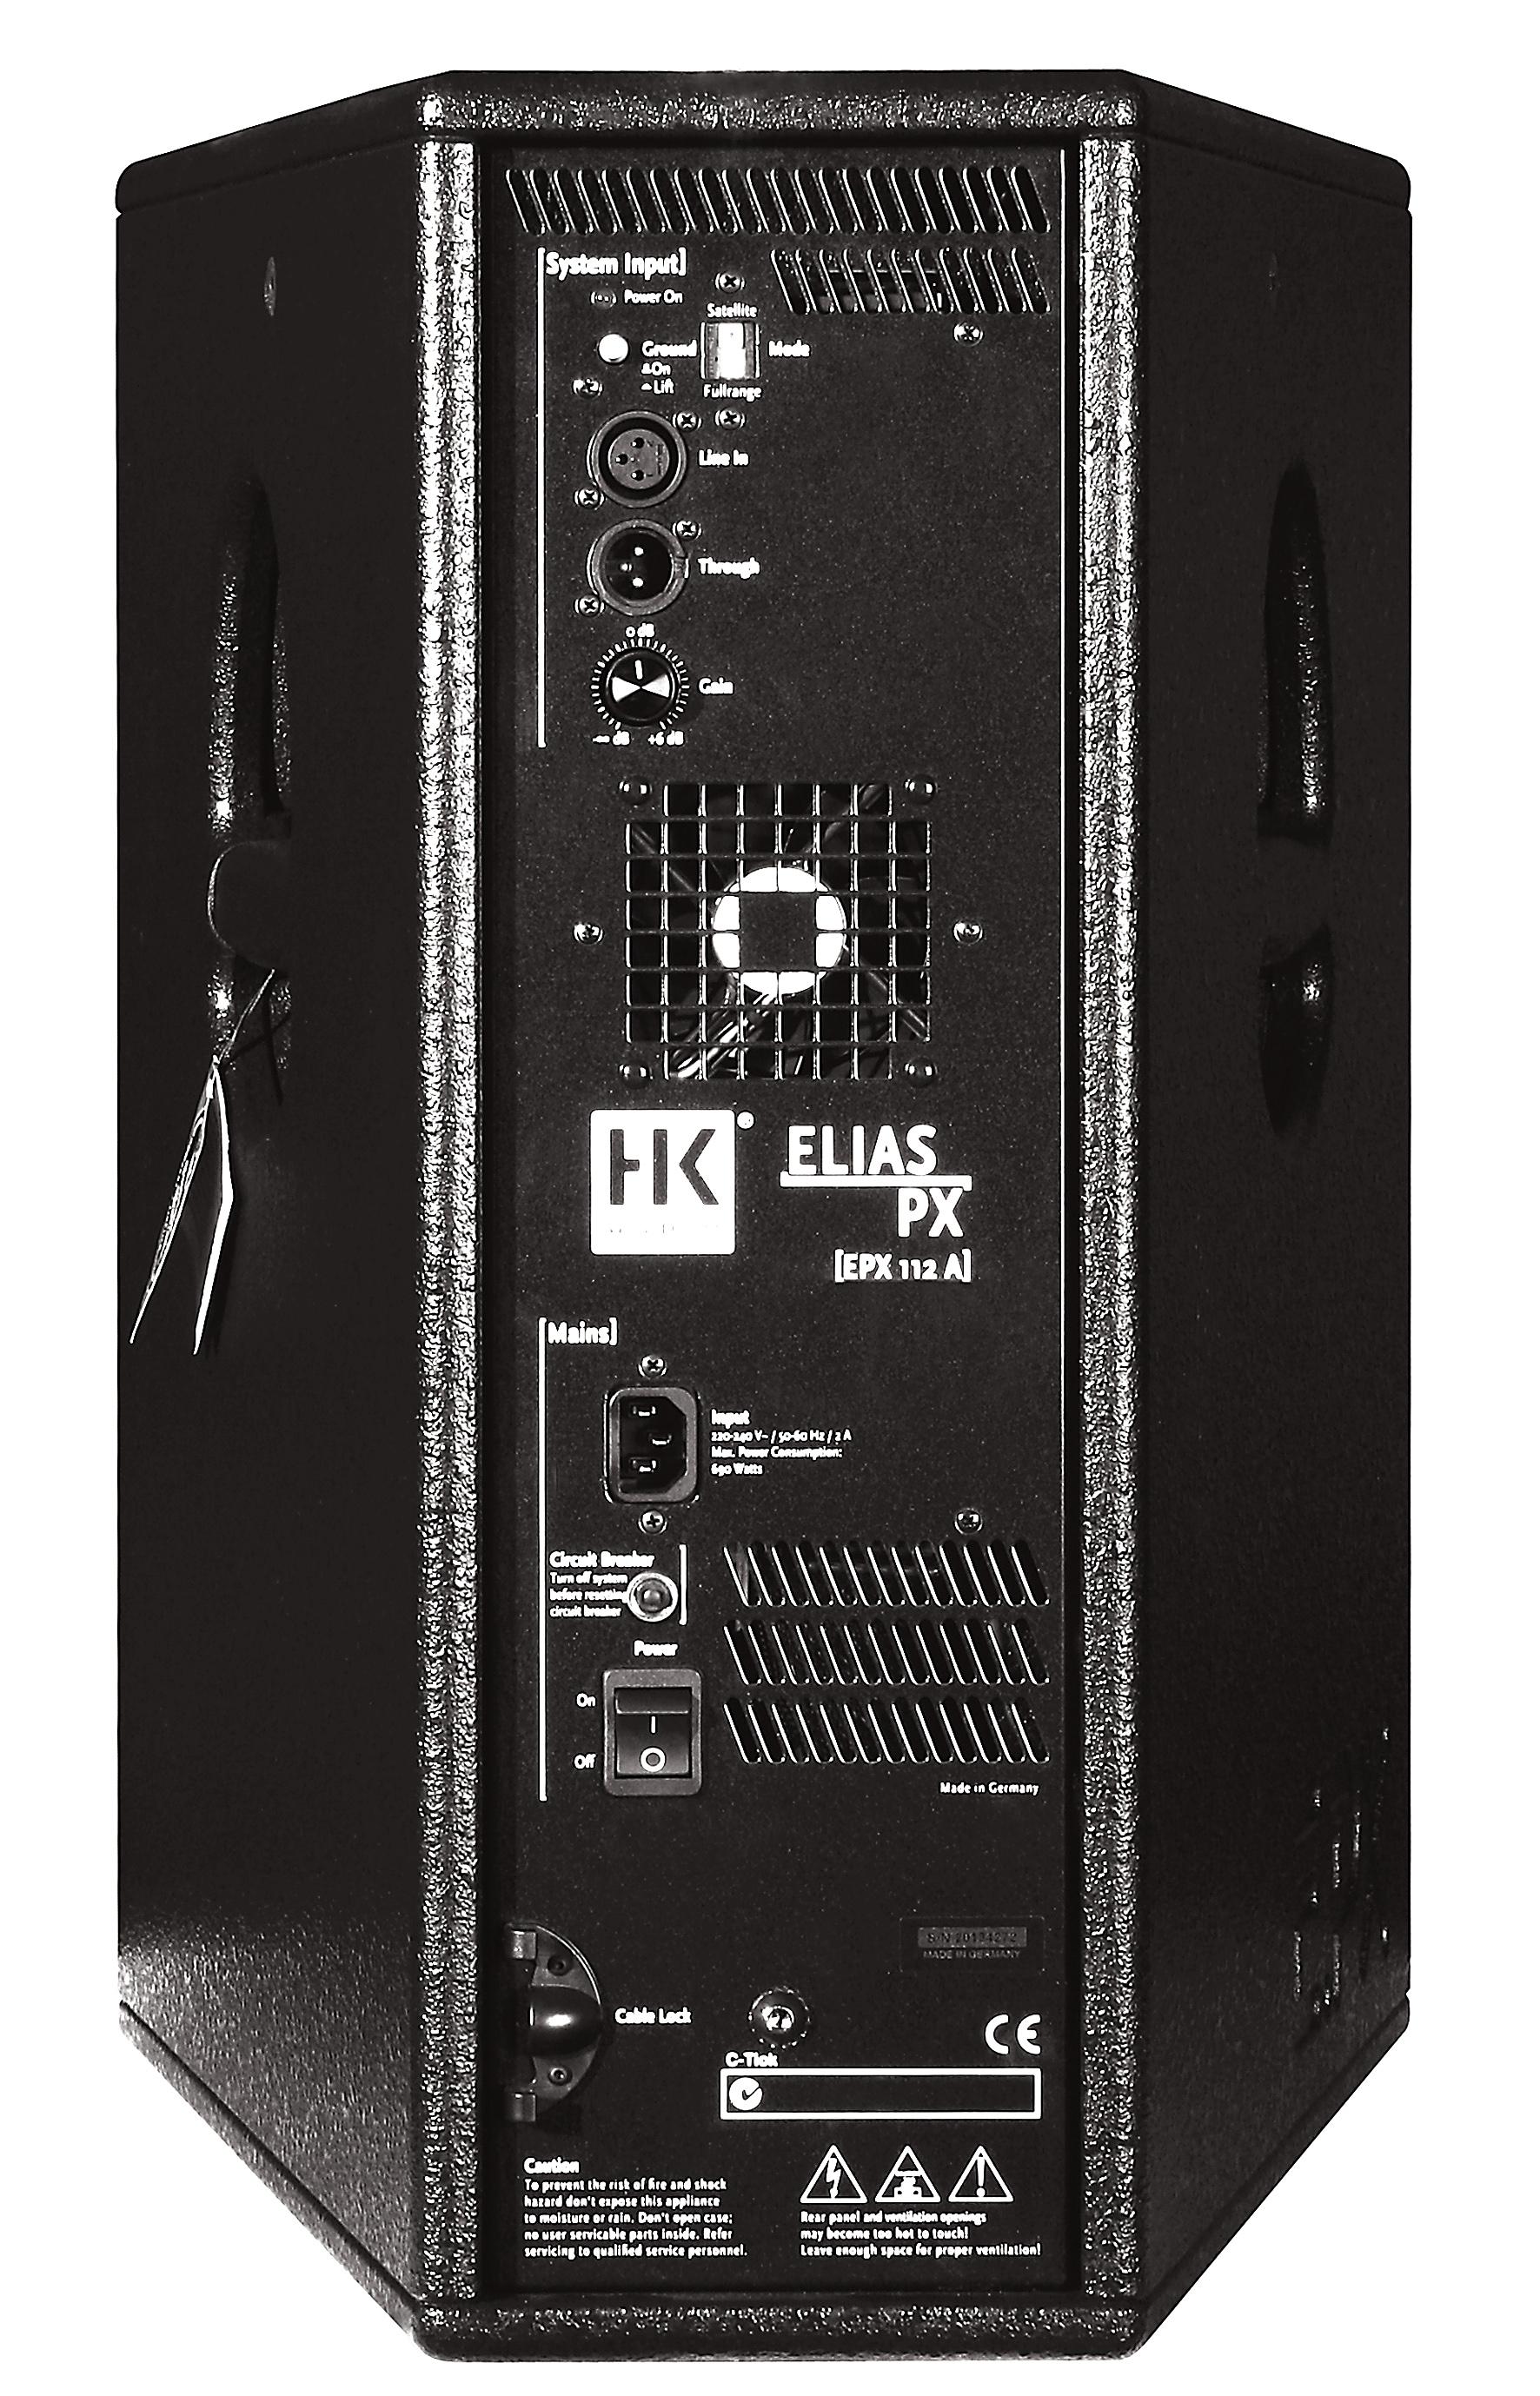 hk audio epx 112 a image 340028 audiofanzine. Black Bedroom Furniture Sets. Home Design Ideas